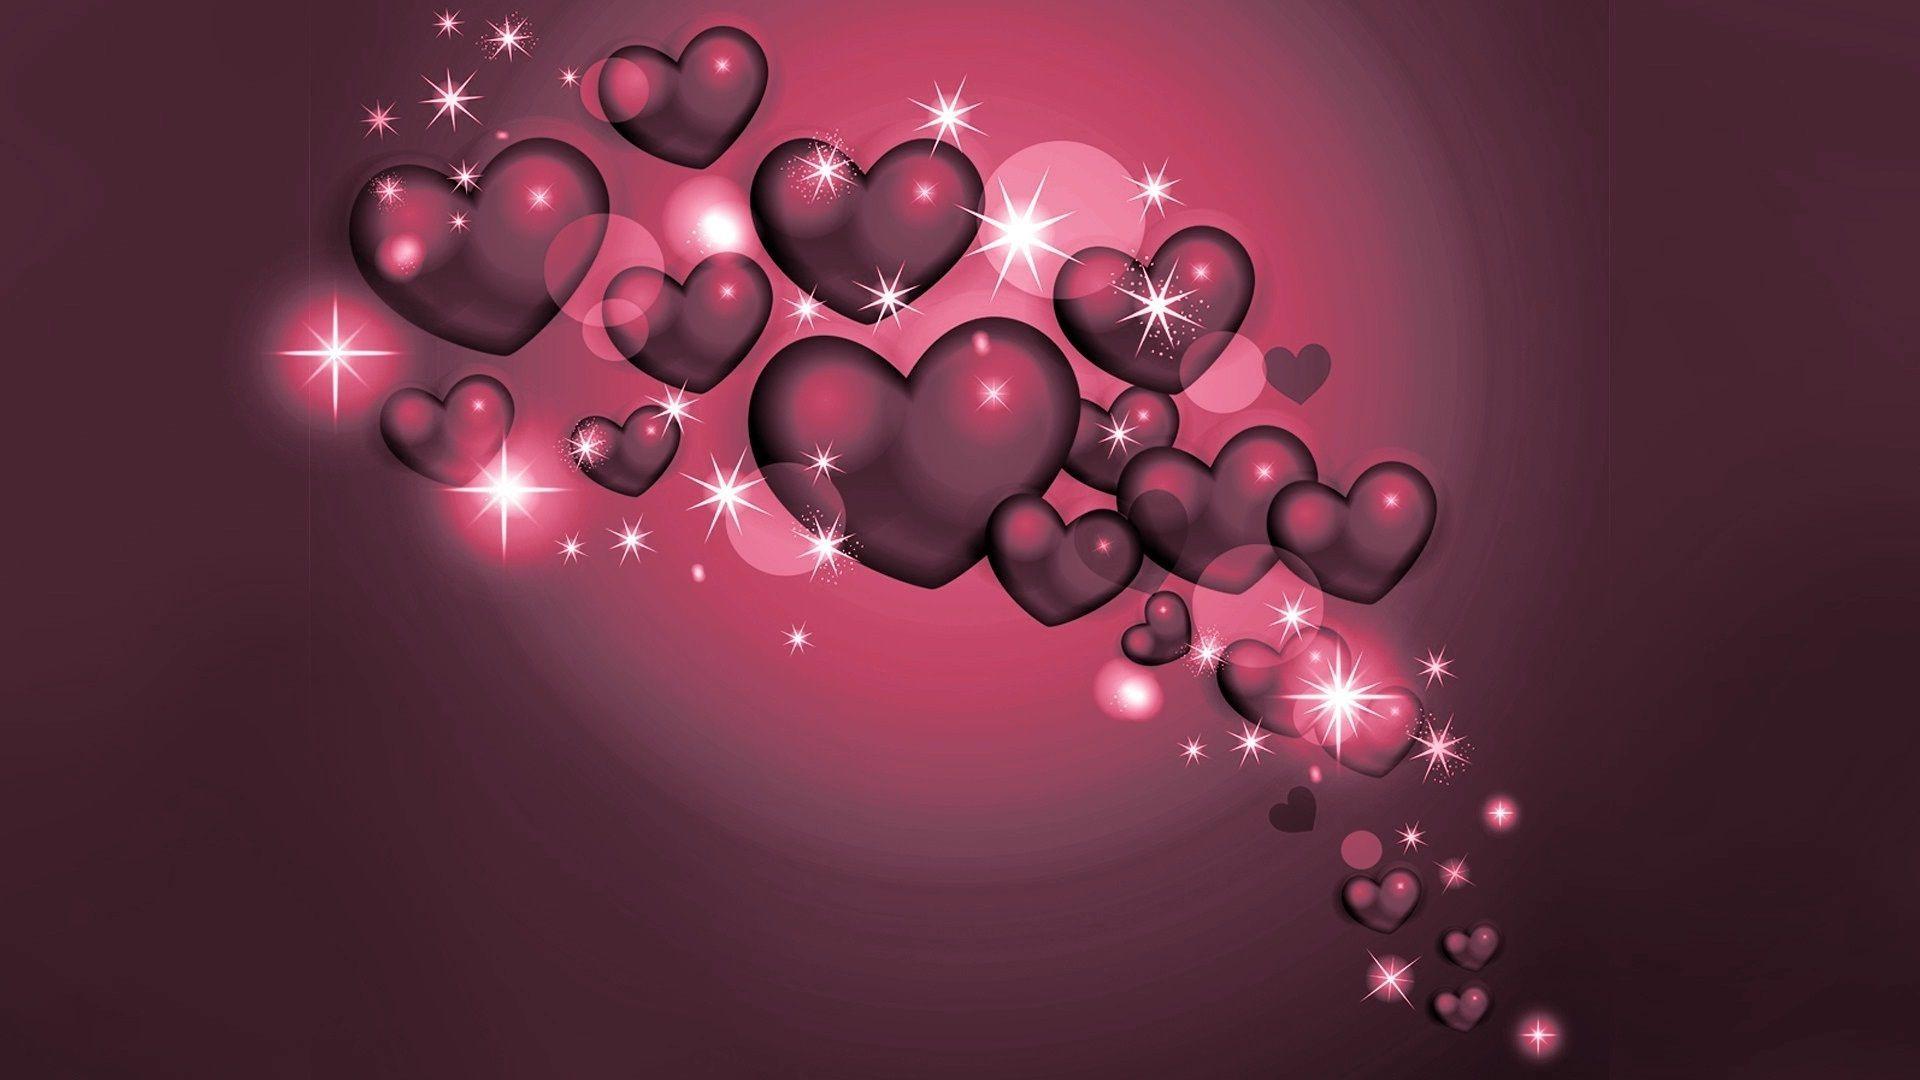 Love Heart Wallpapers Hd Wallpaper Cave Heart Wallpaper Hd Heart Wallpaper Cute Love Wallpapers